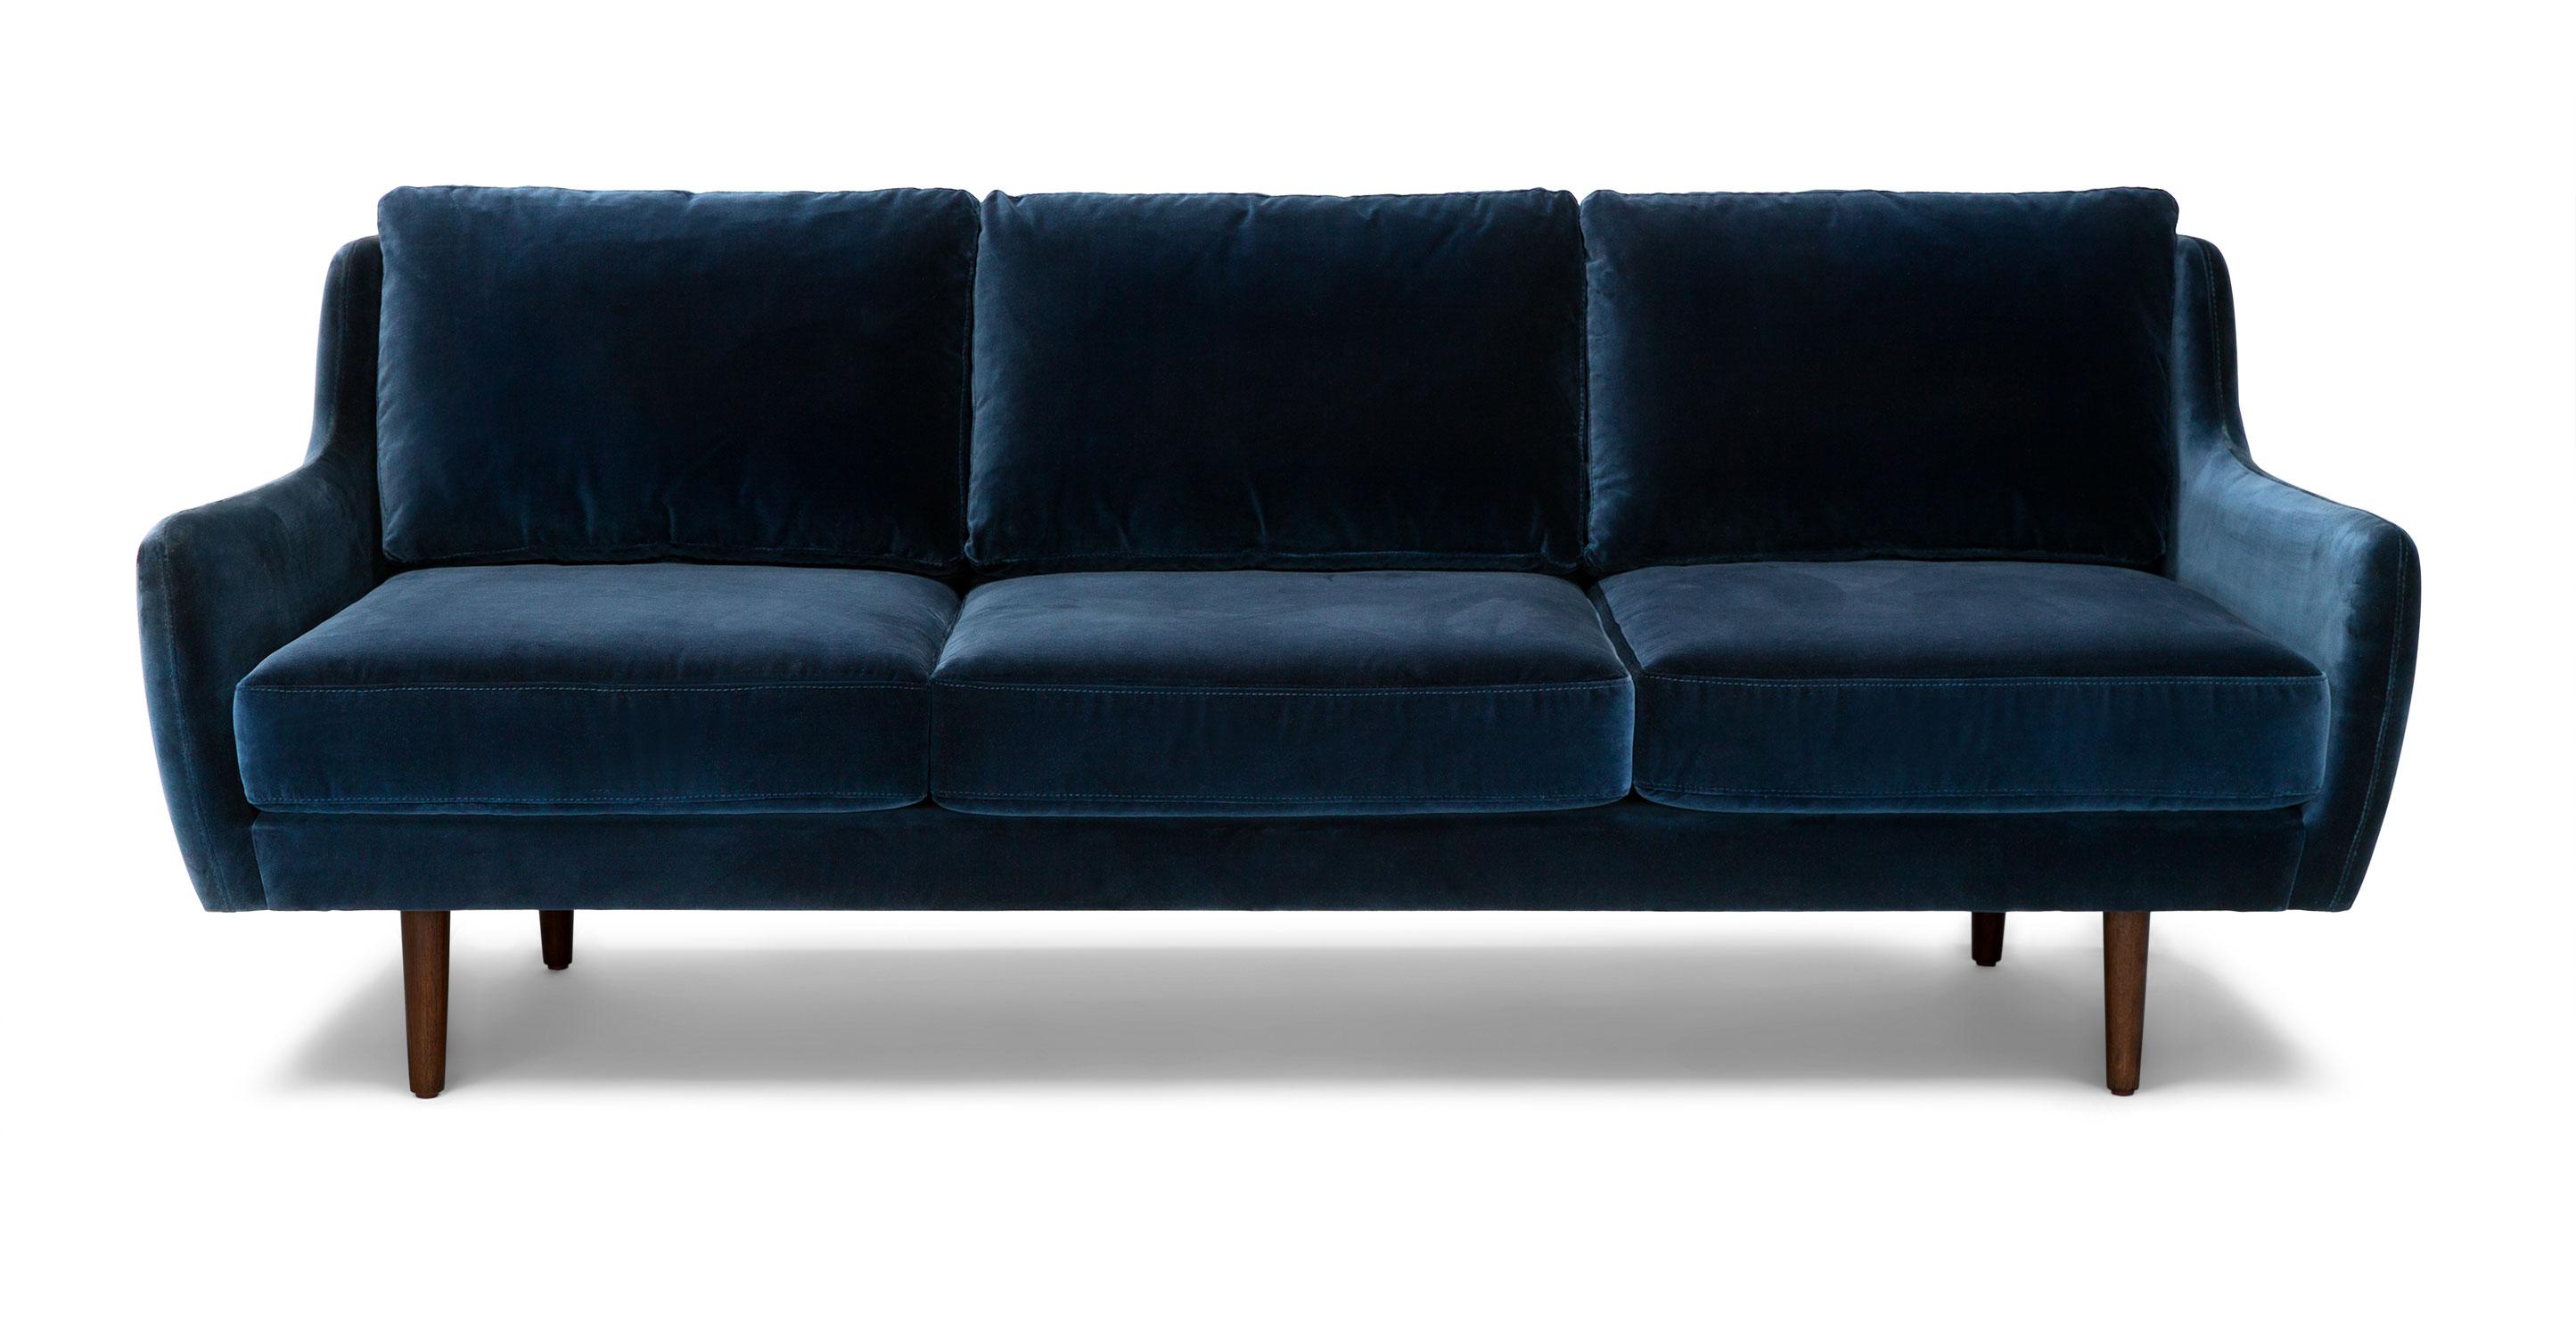 blue leather sofa canada cheap cream sofas matrix cascadia article modern mid